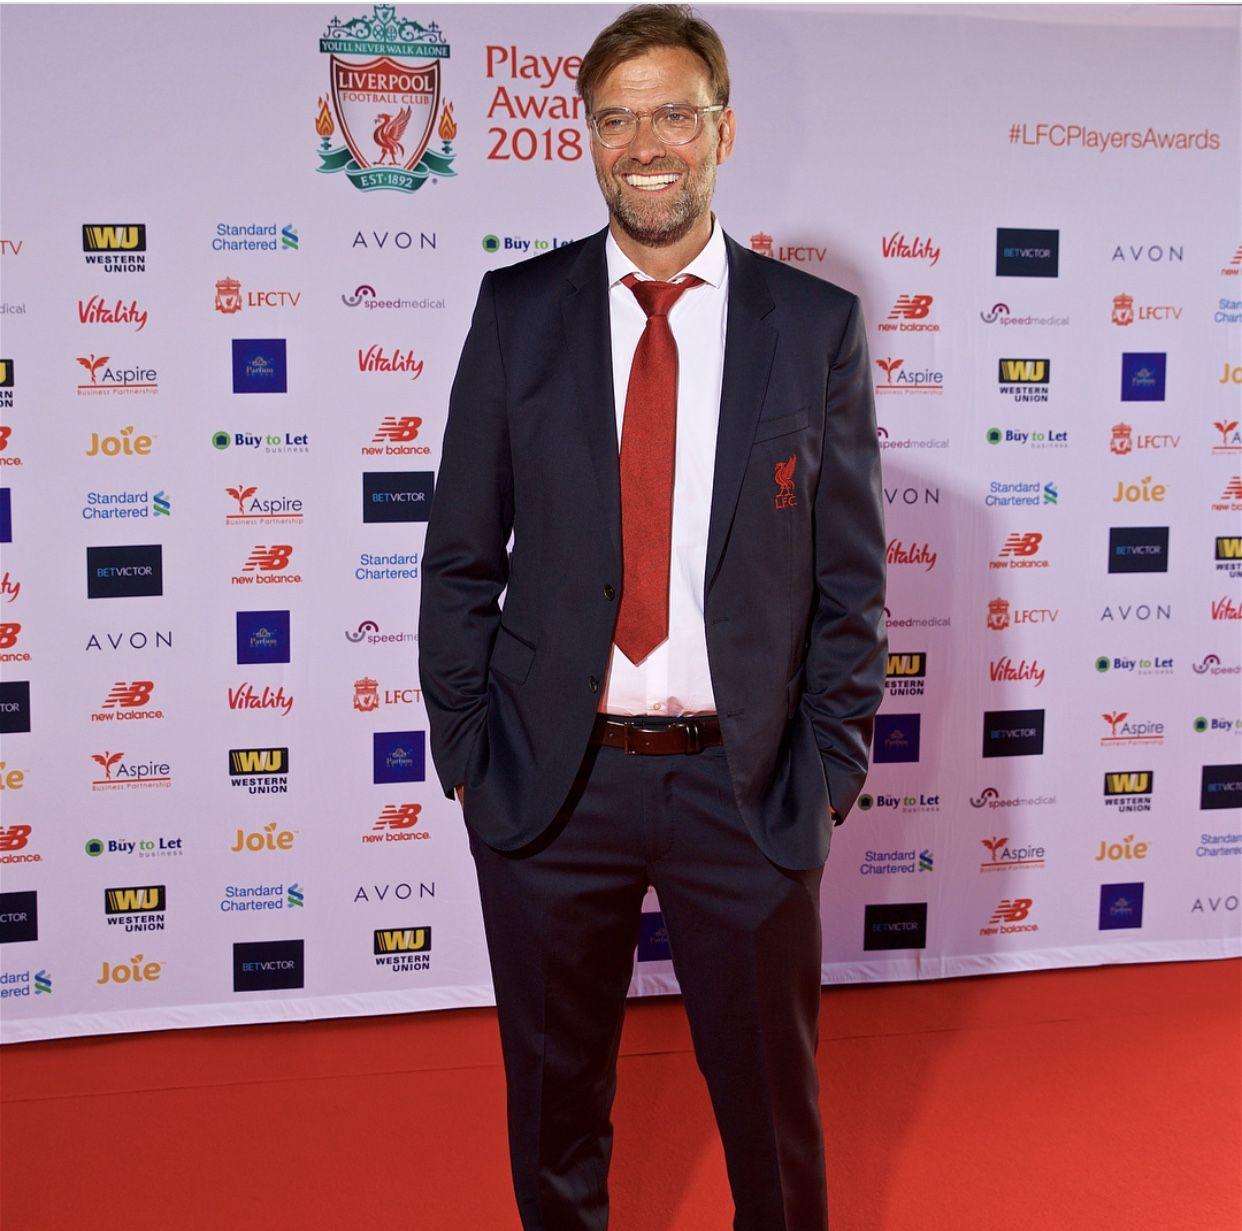 Jurgen Klopp Suits Suit Jacket Liverpool